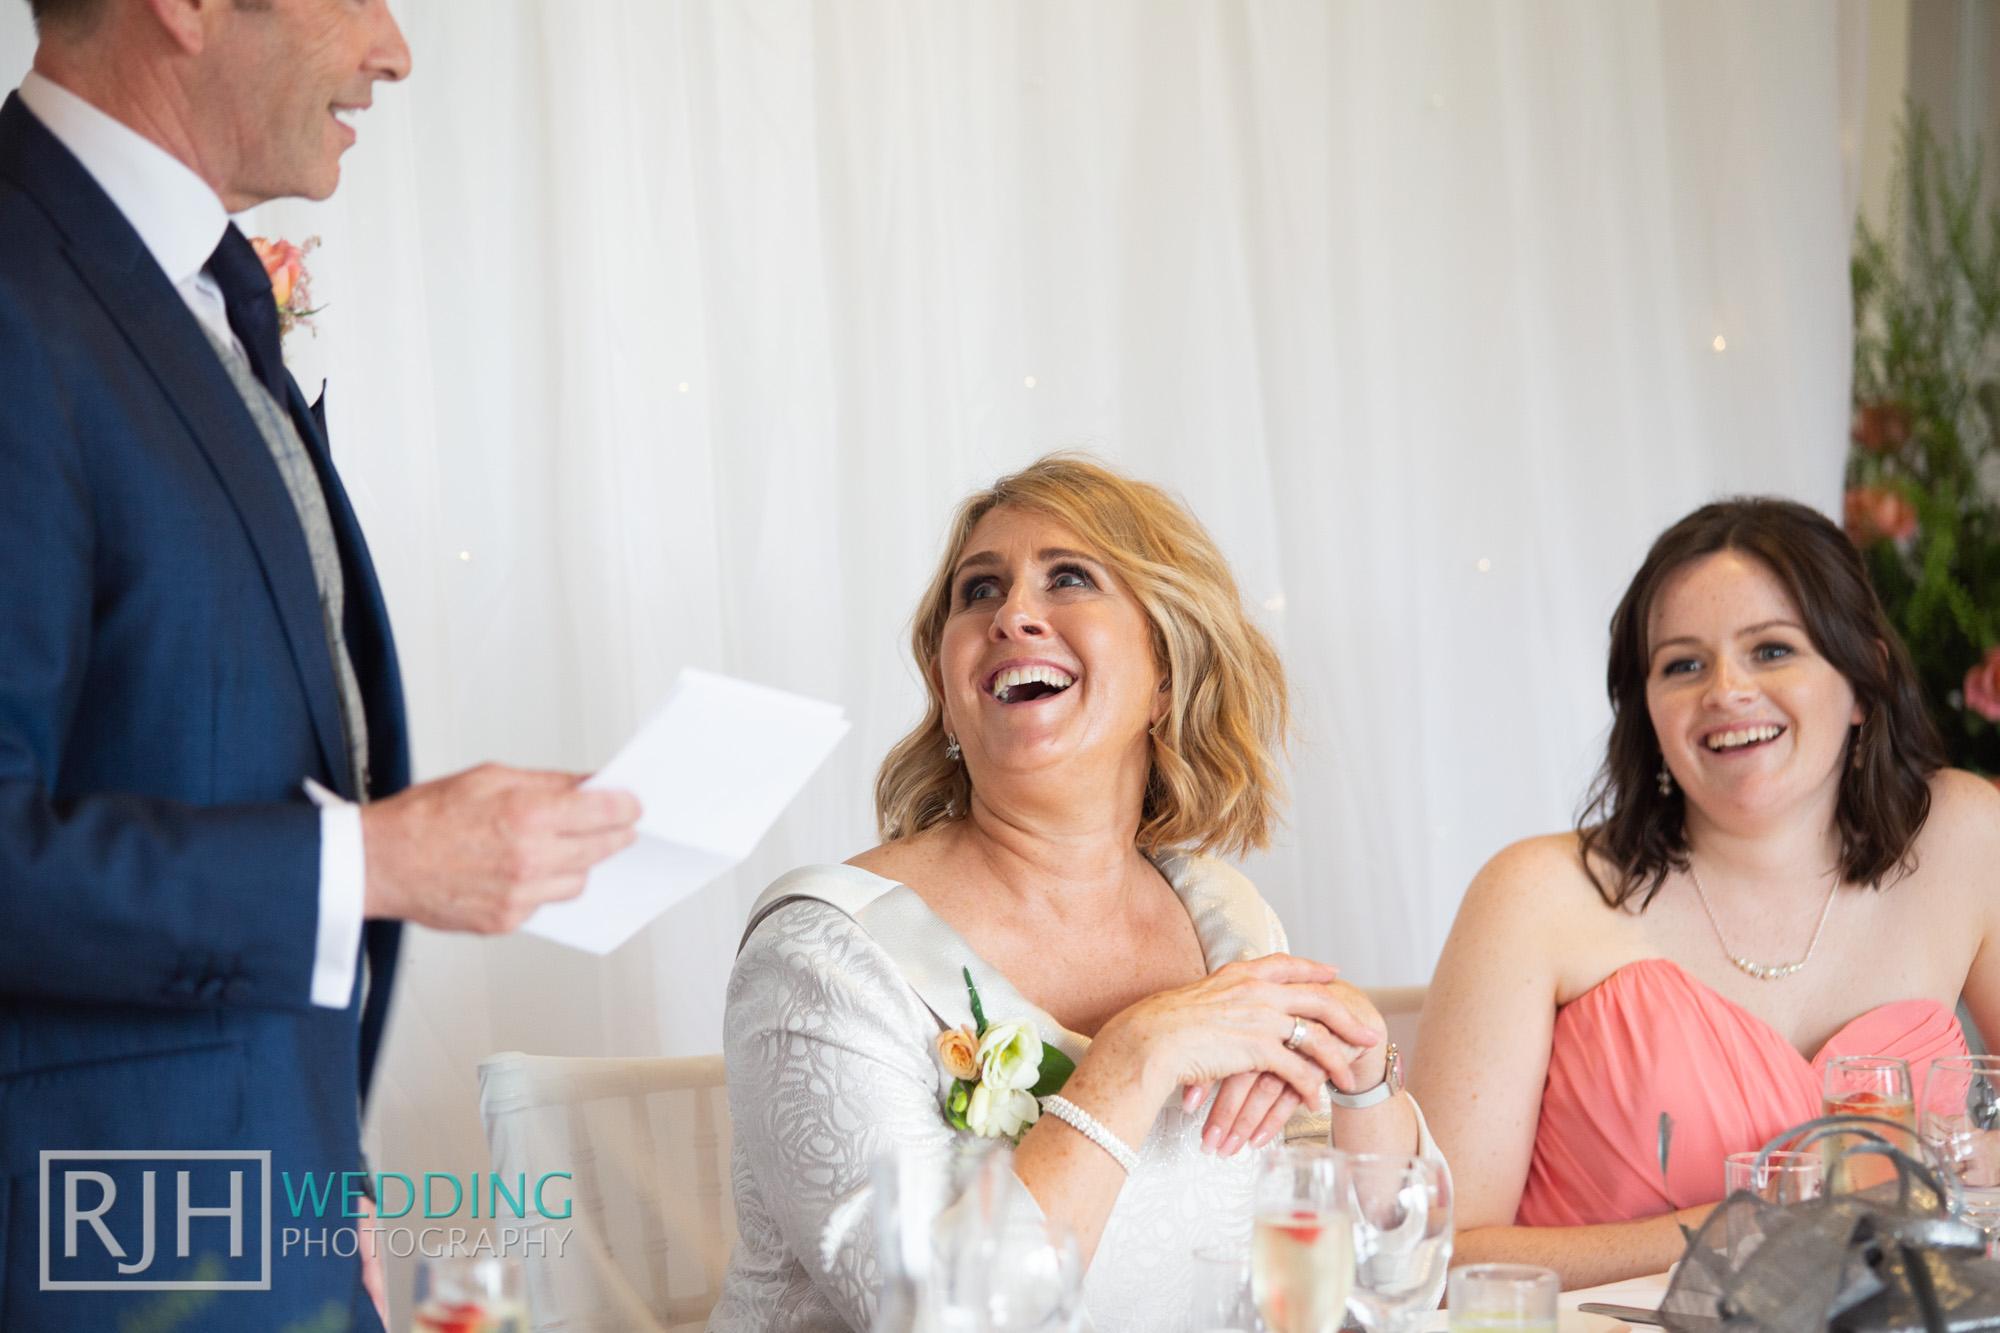 Whirlowbrook Hall Wedding Photography_Jack & Lydia_052_IMG_4495.jpg